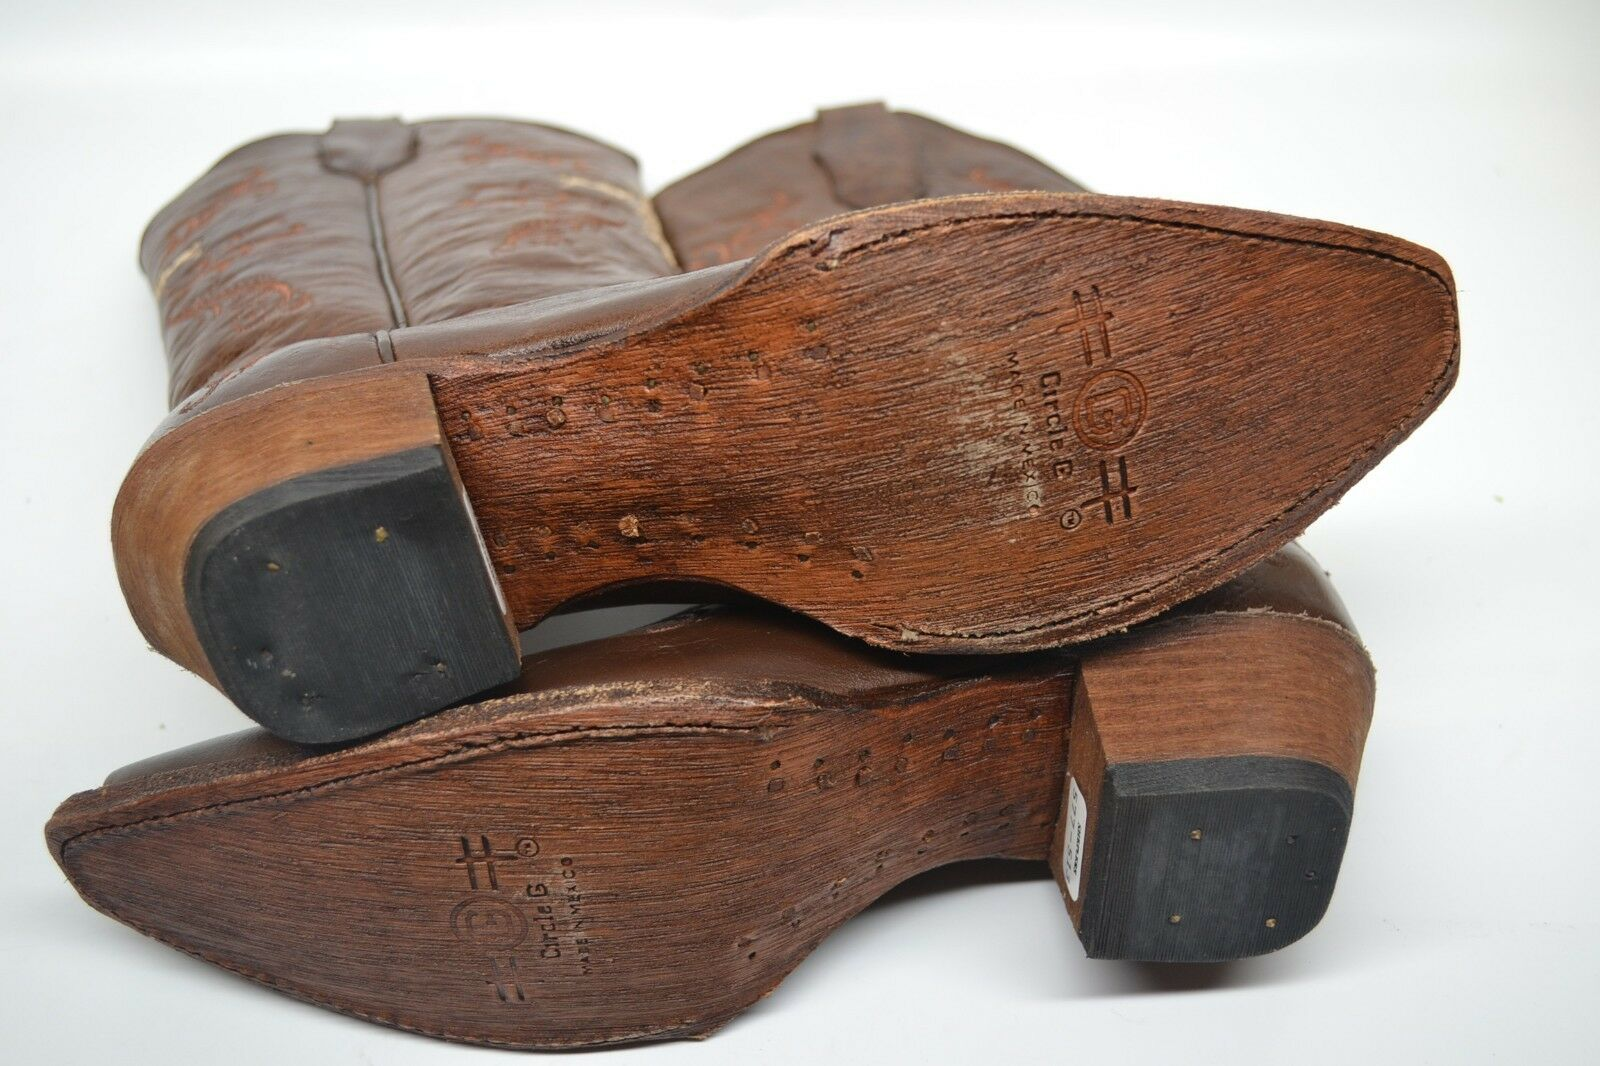 Circle G by Corral WOMENS 9 M Cowboy Western Western Western Boots Chocolate Cognac Cross L5039 2295f5